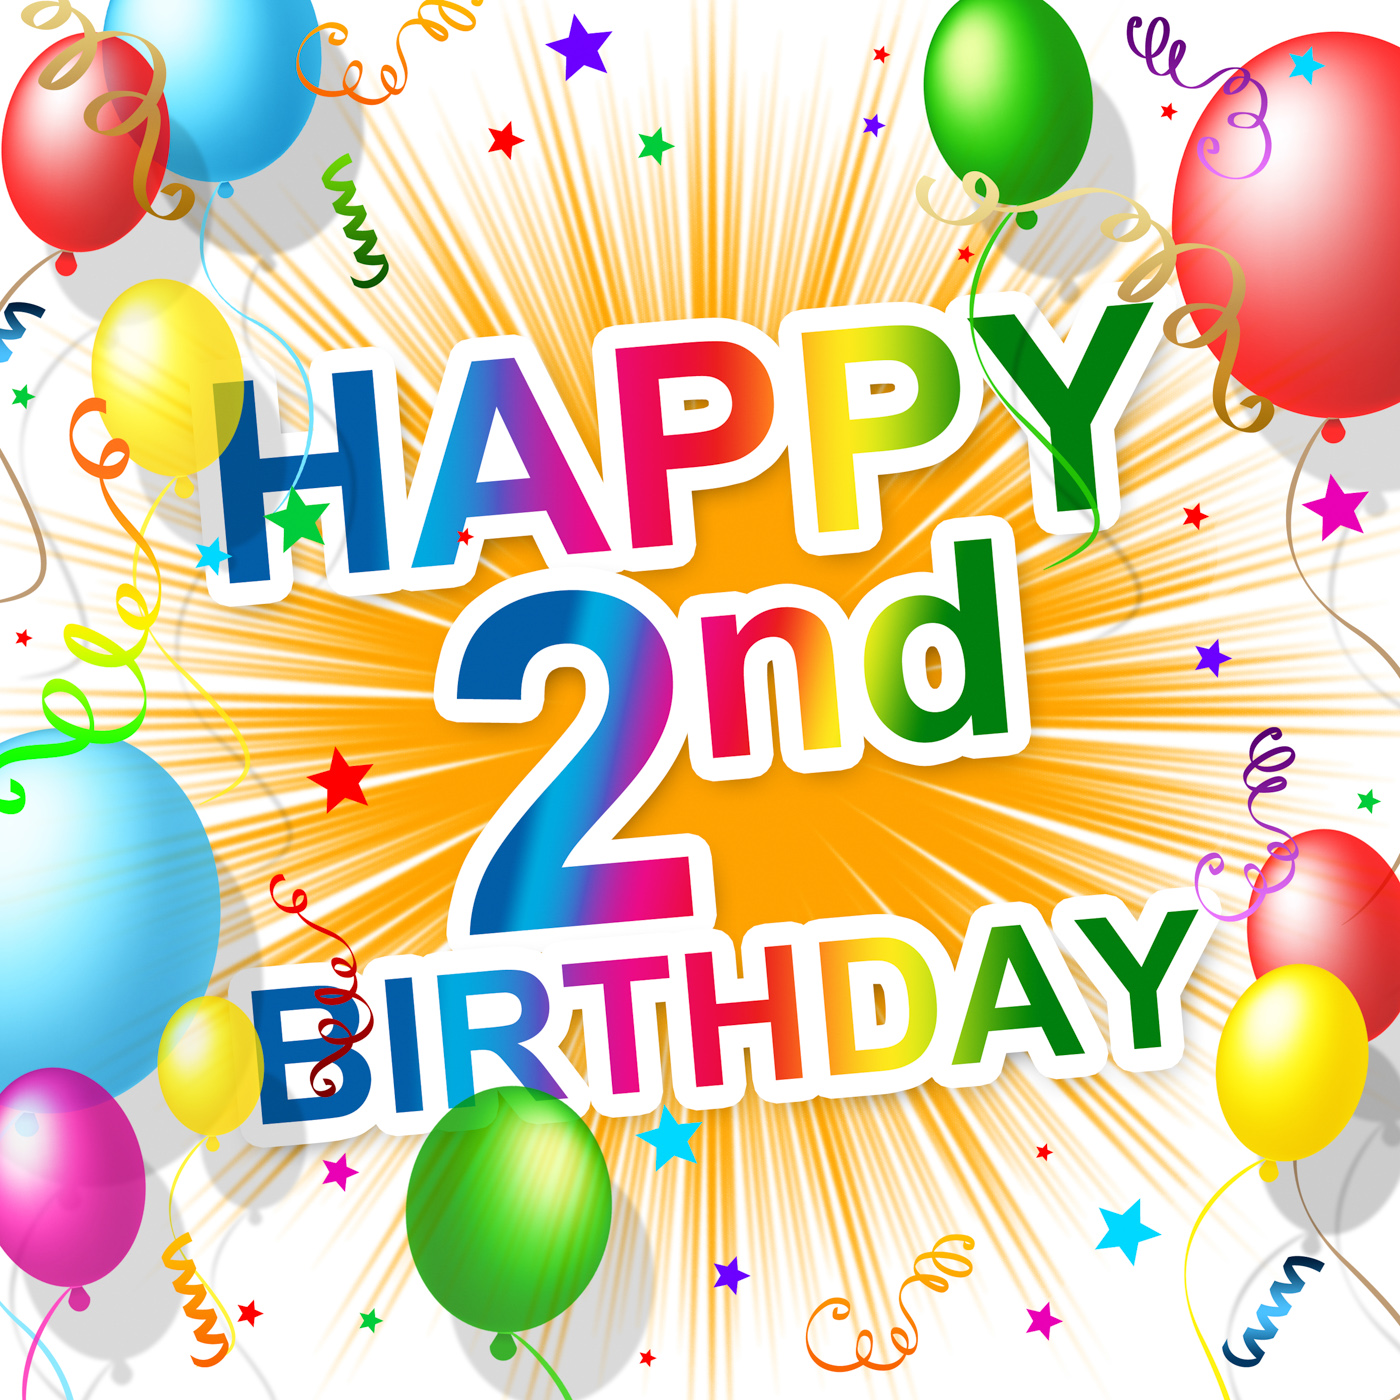 Second Birthday Shows Congratulating Celebrate And Celebration, 2, 2nd, Birthday, Celebrate, HQ Photo